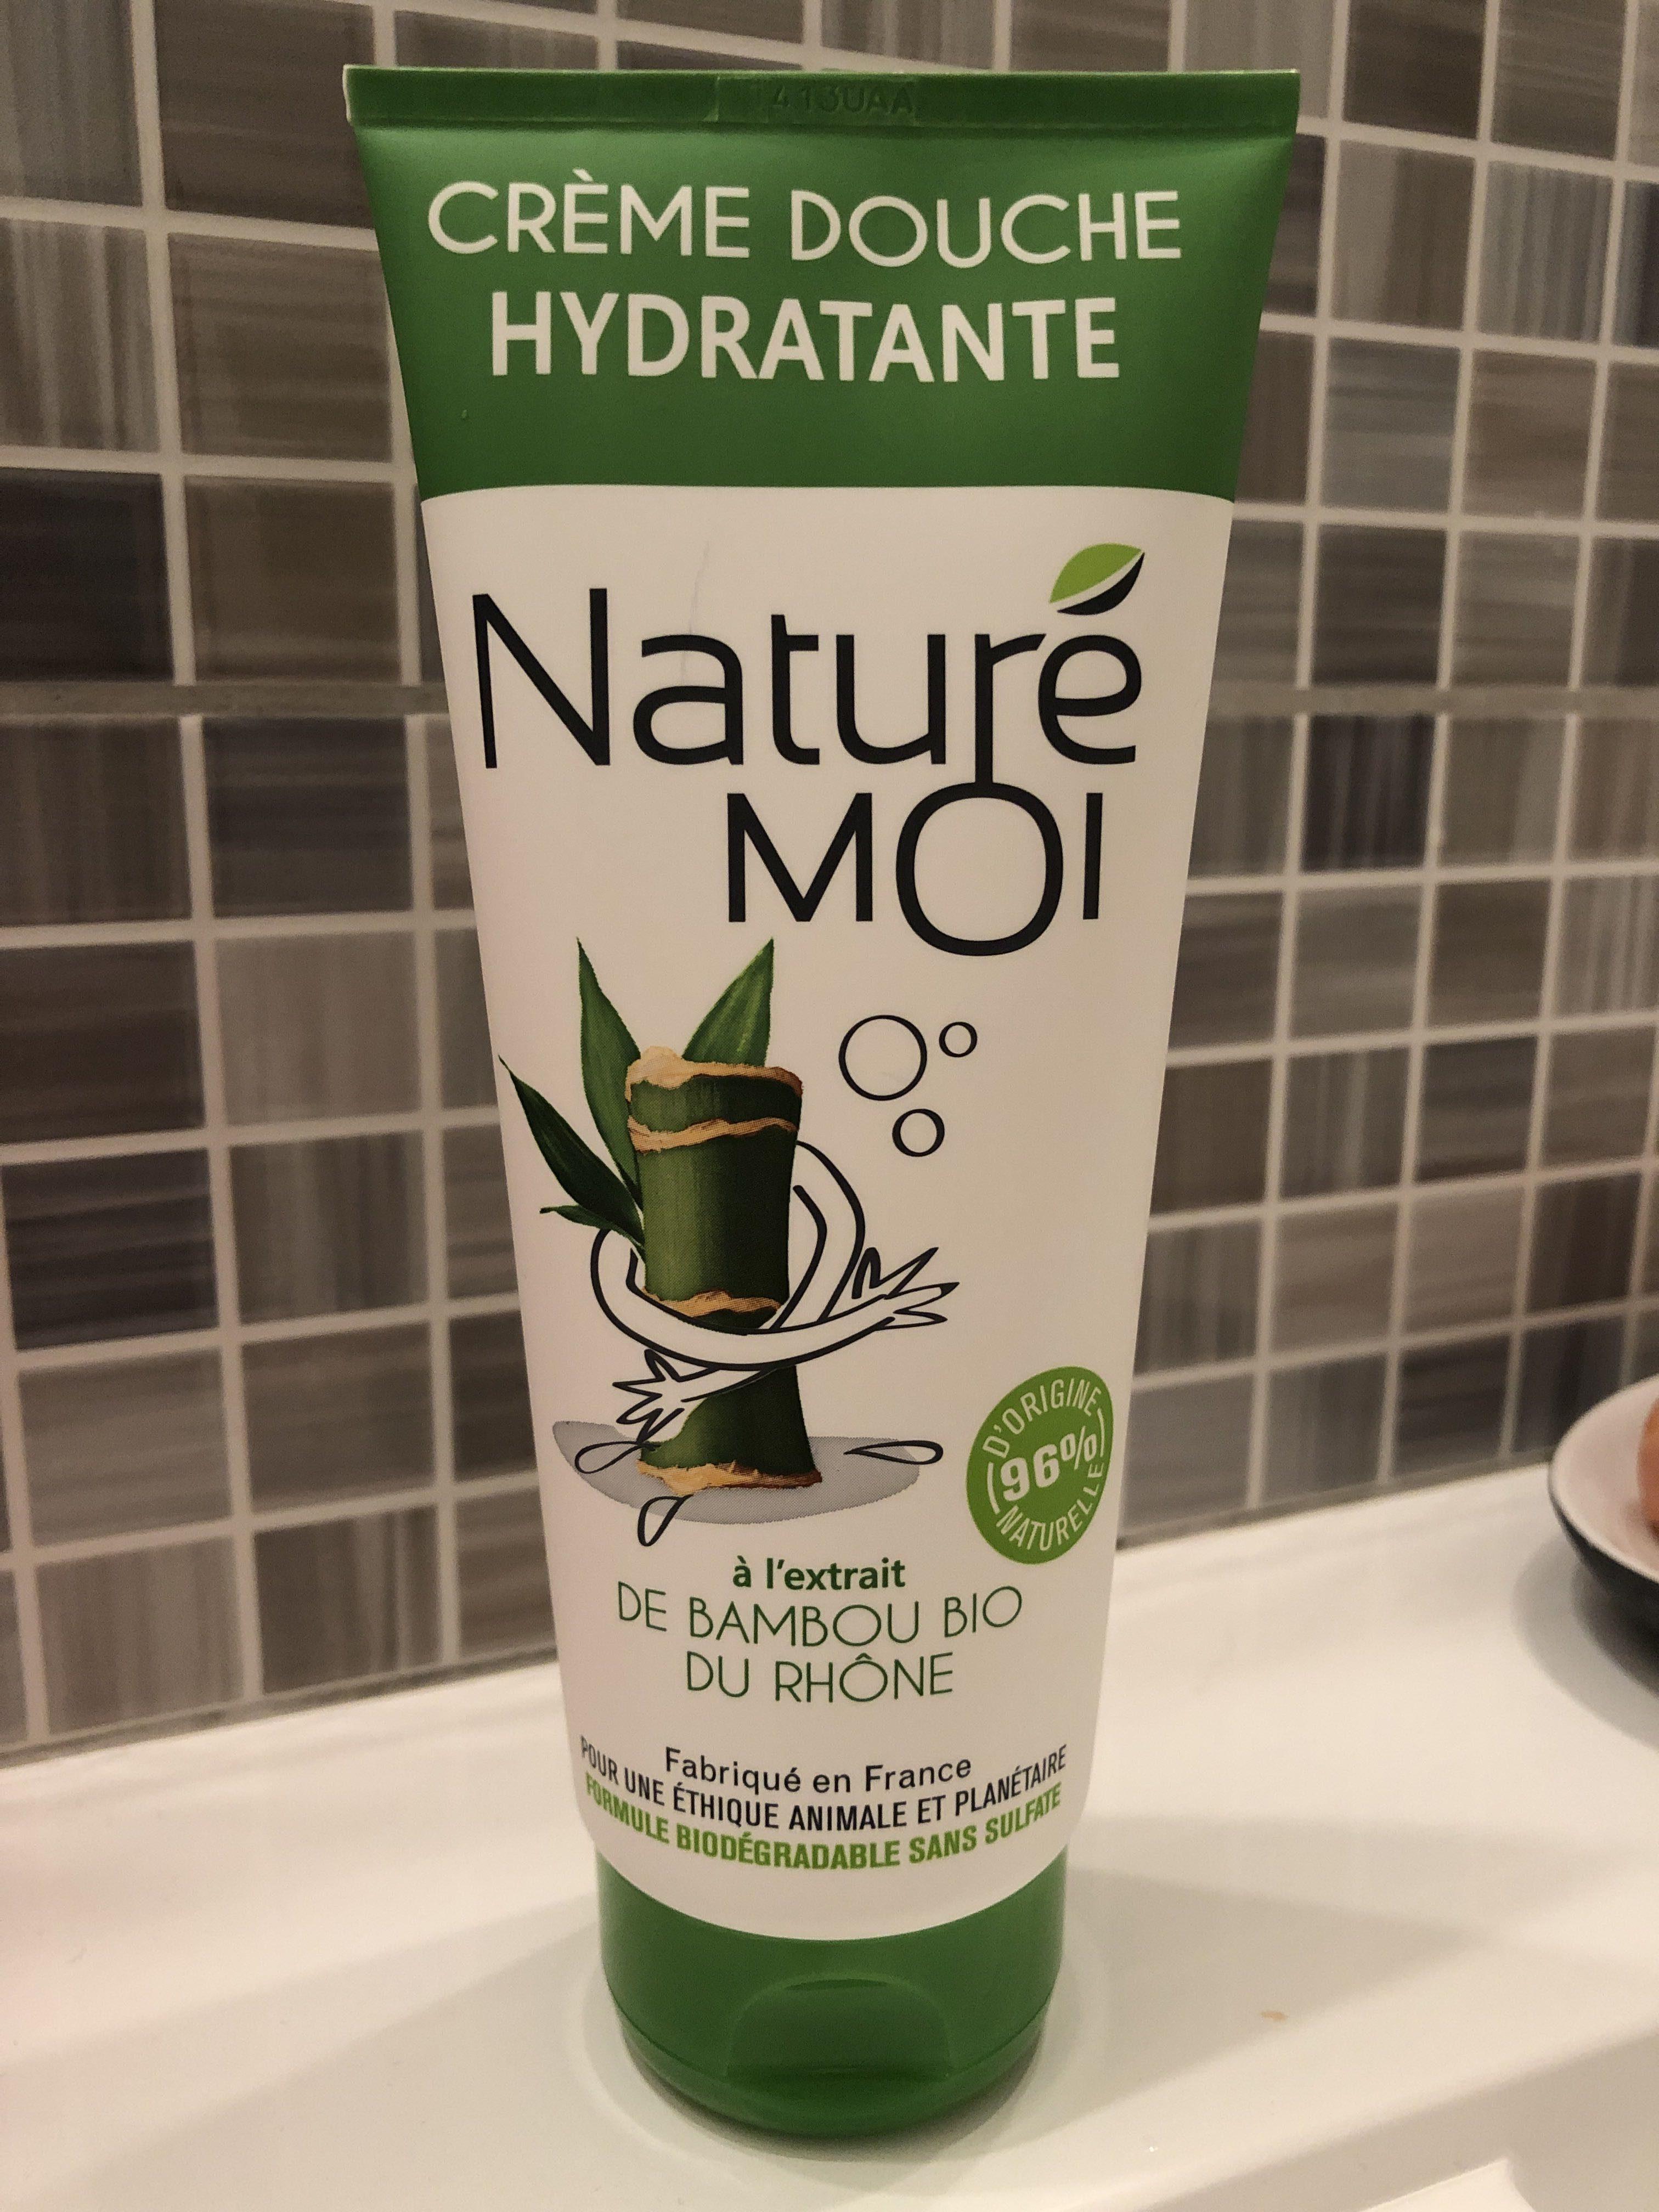 Crème Douche Hydratante - Product